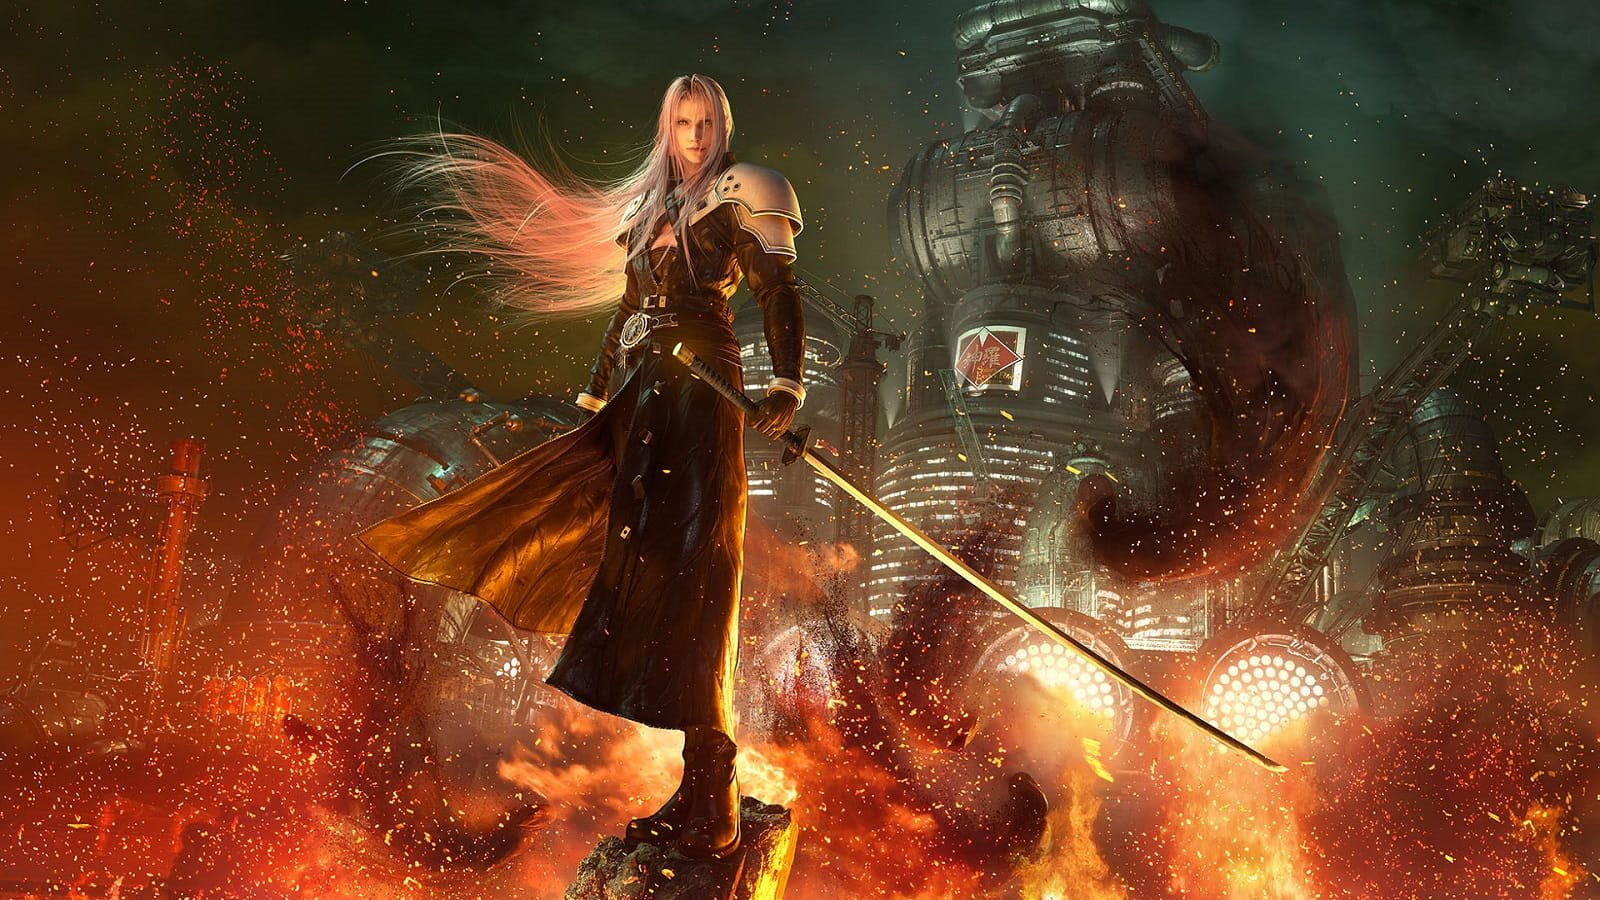 Final Fantasy VII Remake; Sephiroth